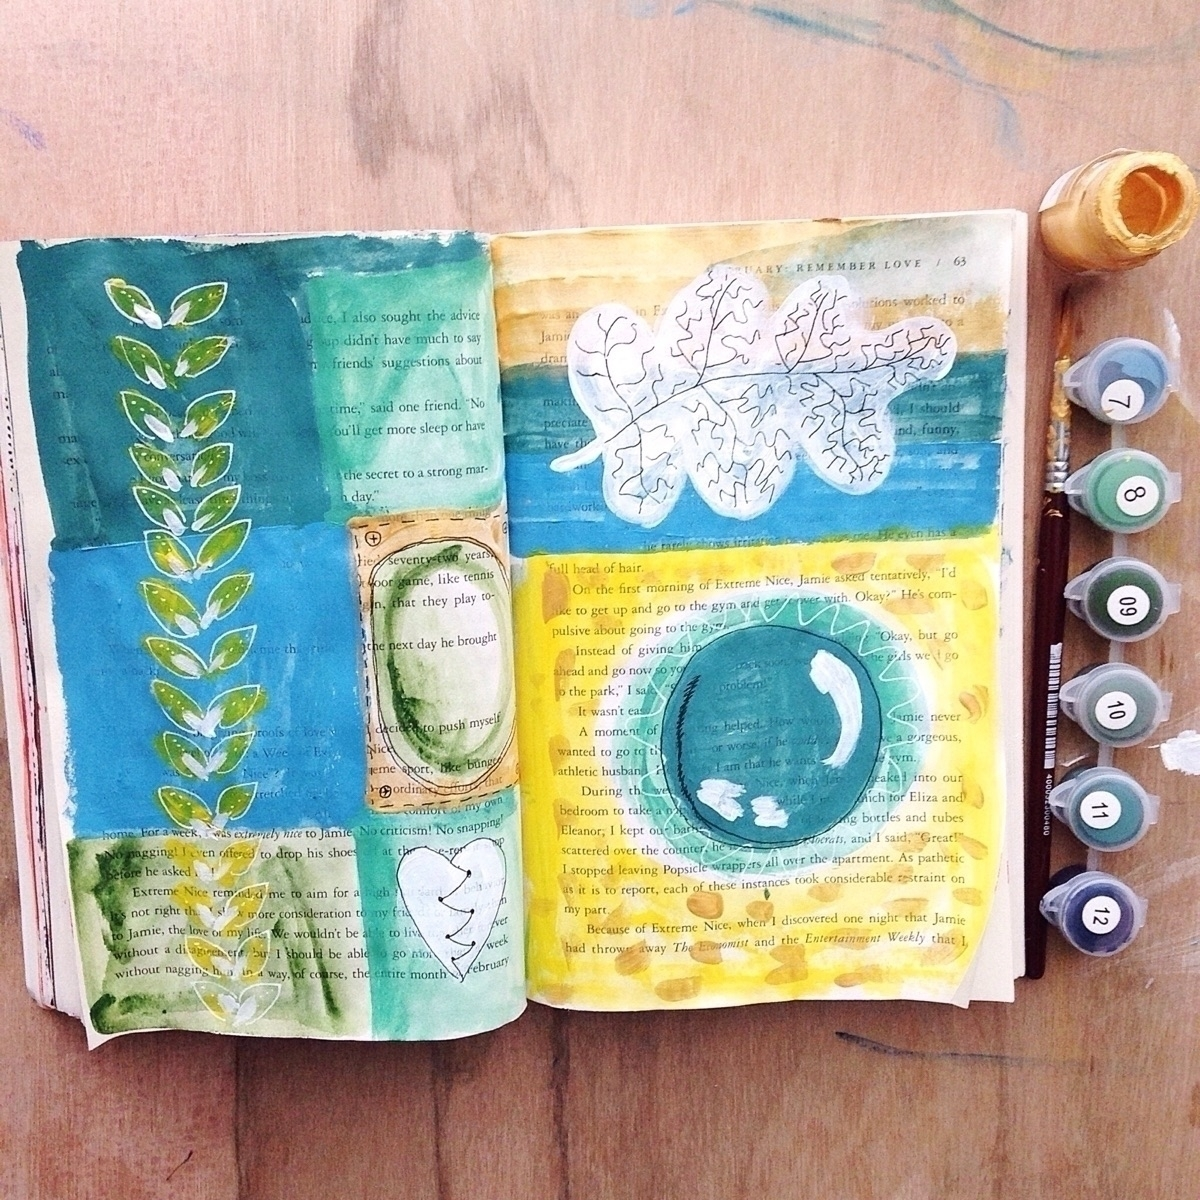 School break means art journal  - beholderess   ello